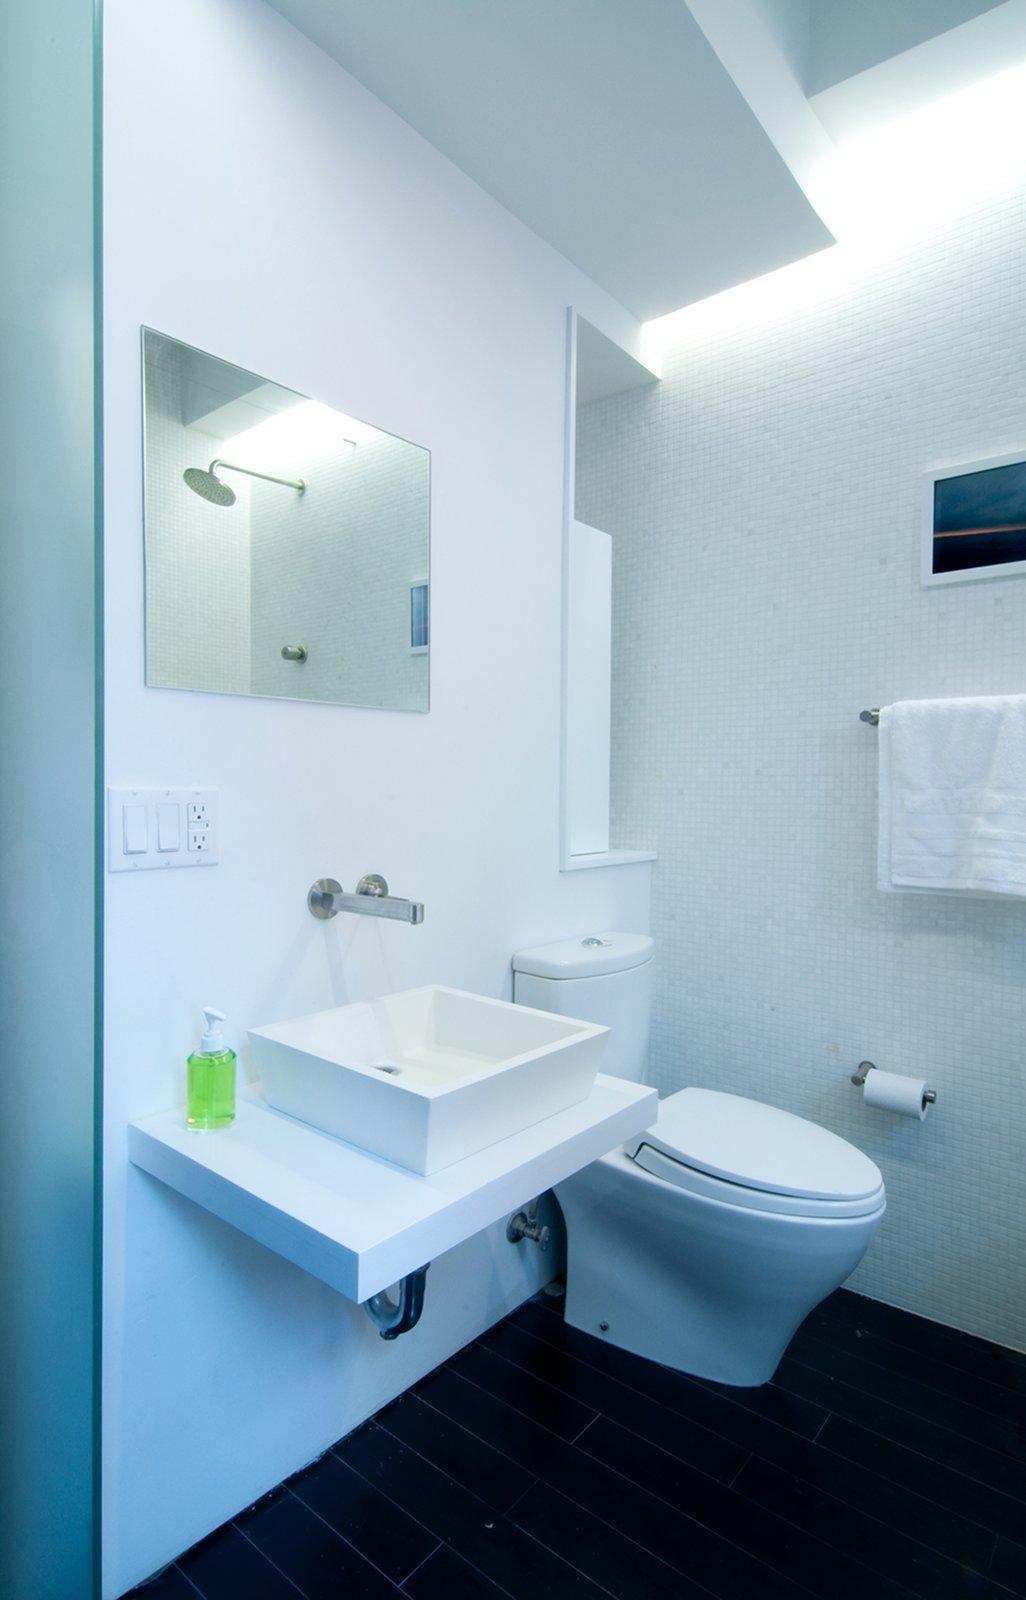 Bath Room, Vessel Sink, Dark Hardwood Floor, and Mosaic Tile Wall  Park Avenue Studio